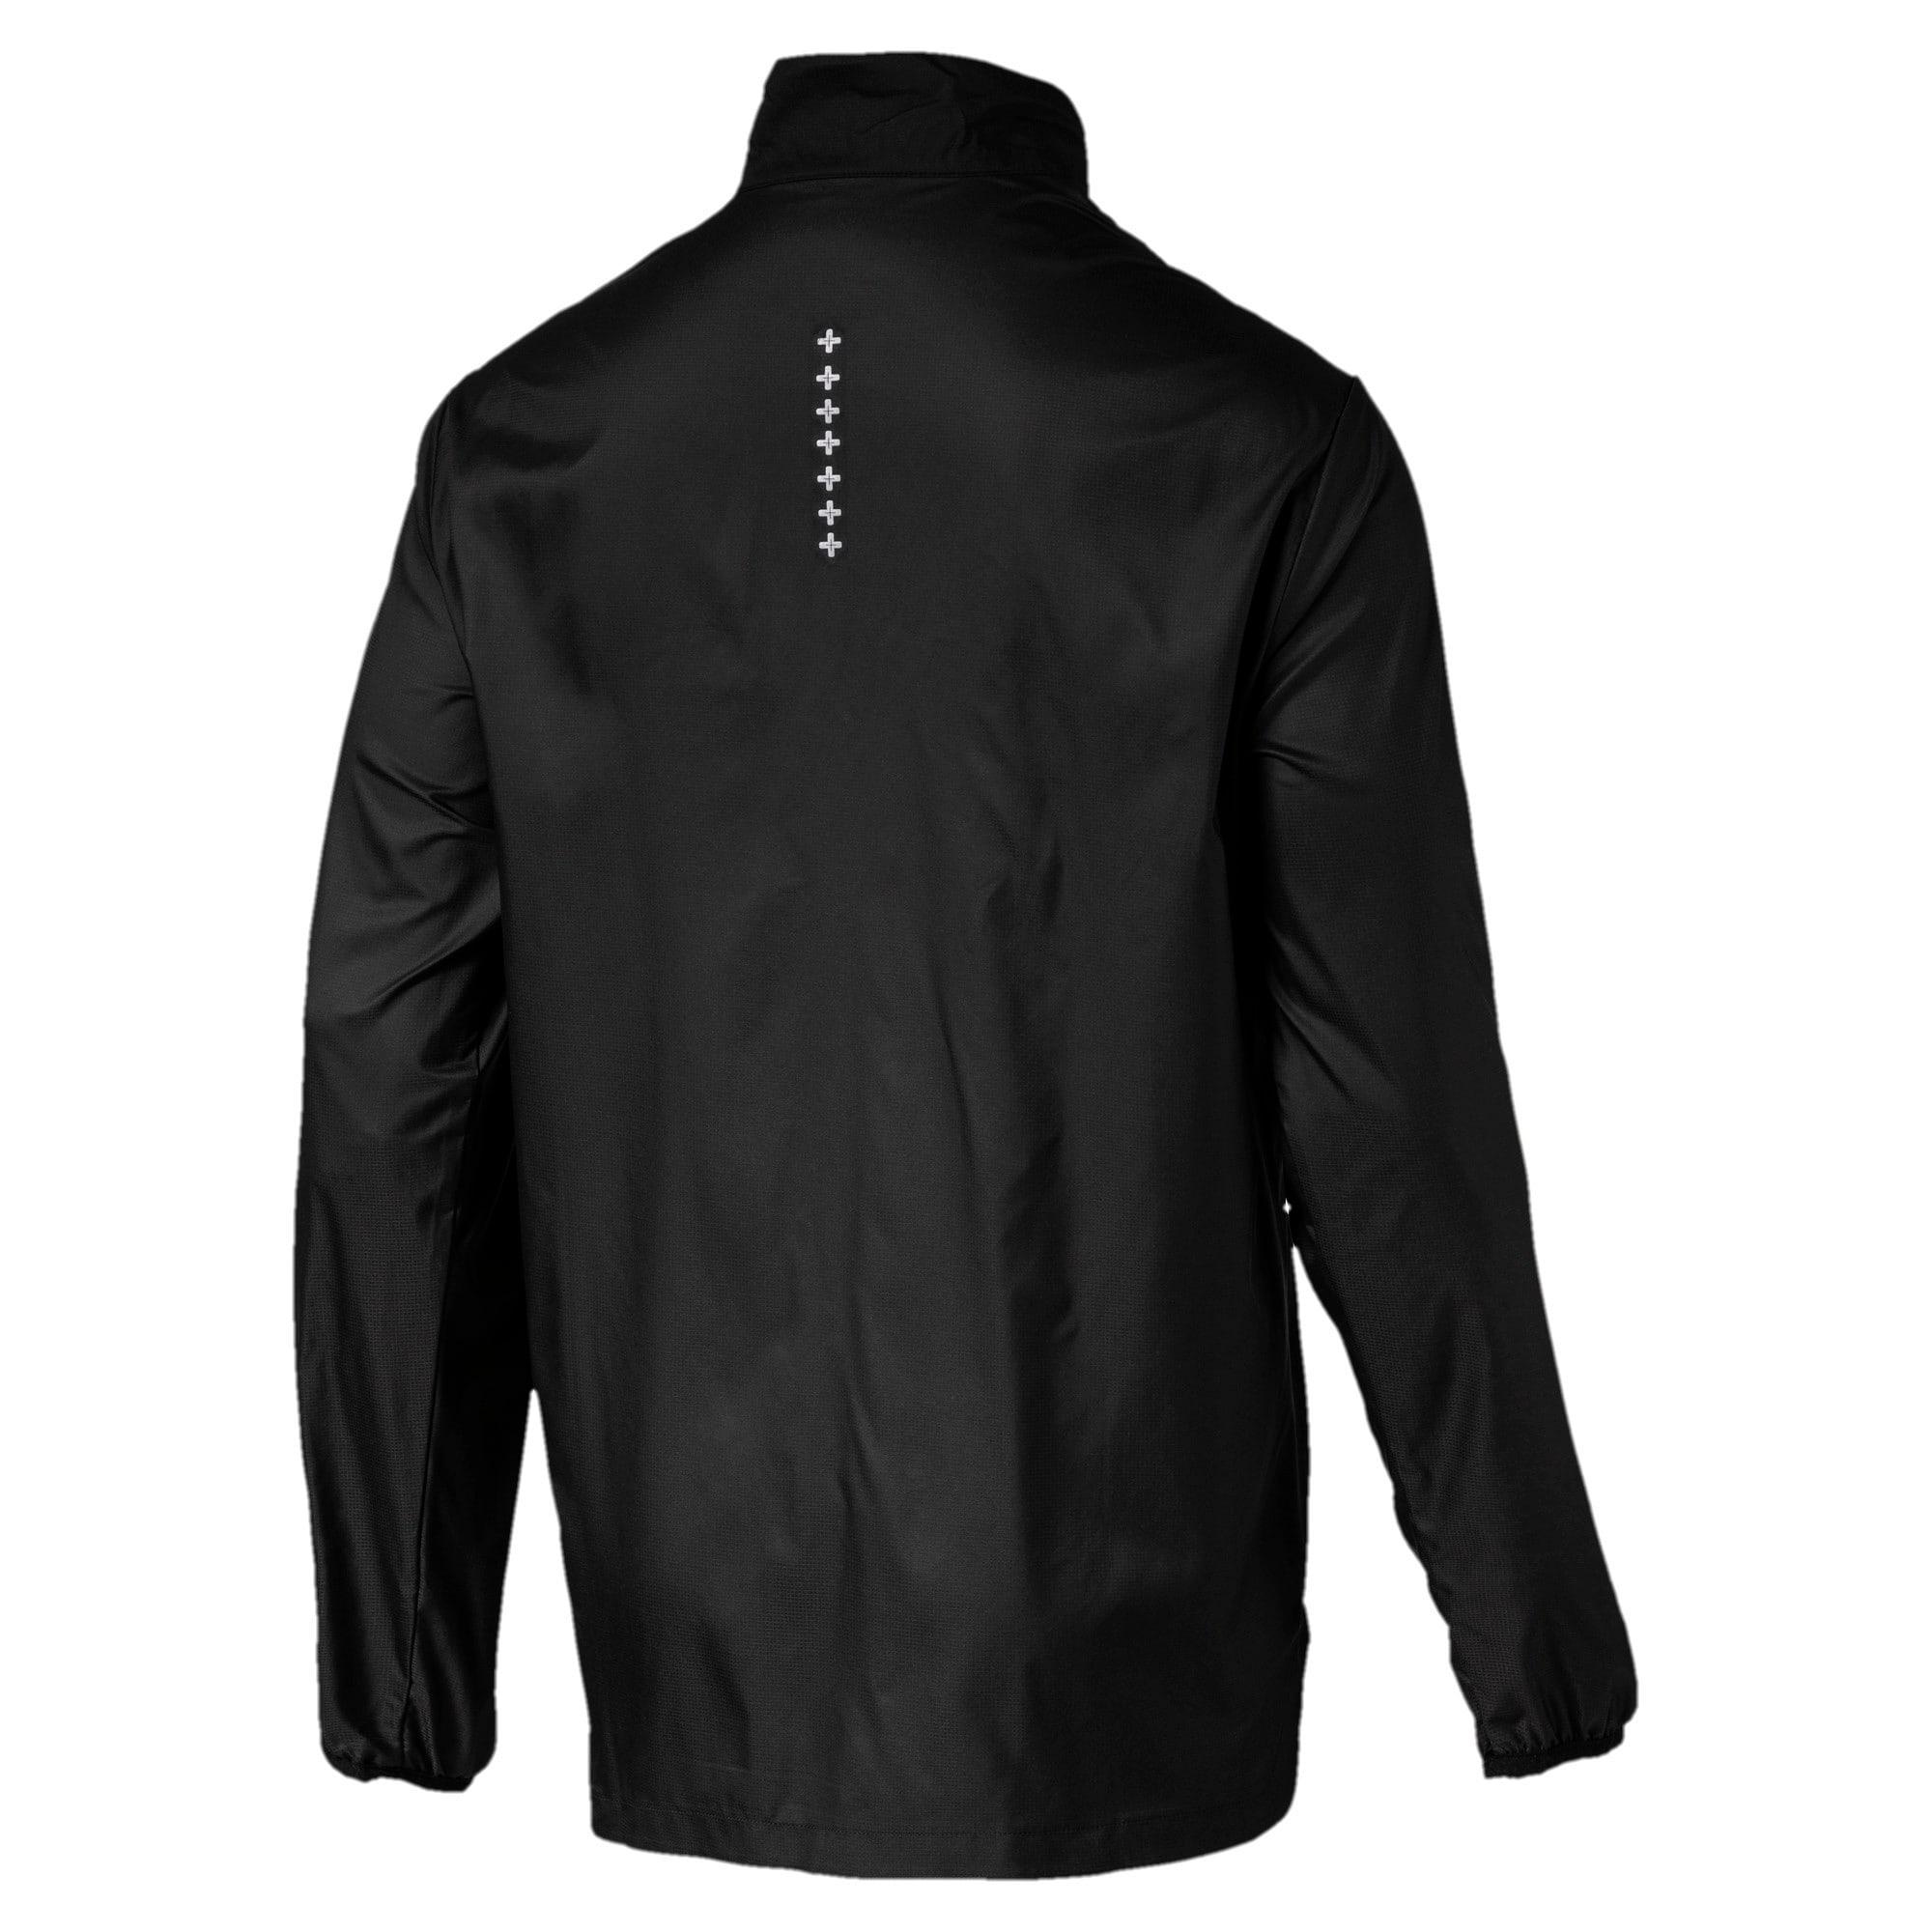 Thumbnail 5 of Running Men's IGNITE Jacket, Puma Black--black, medium-IND